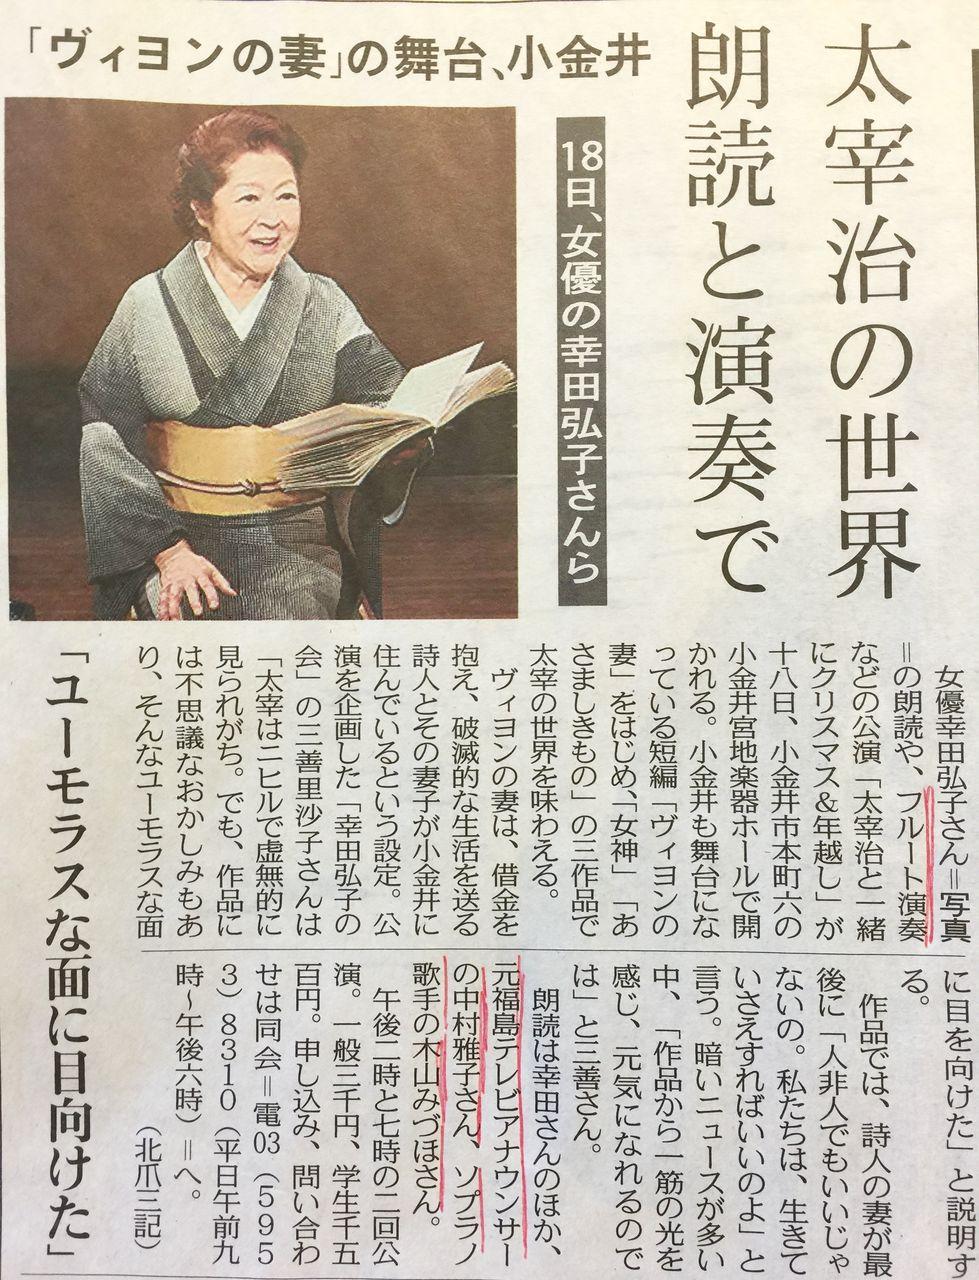 mizuho kiyama's home page東京新聞都民版に掲載されました。コメント